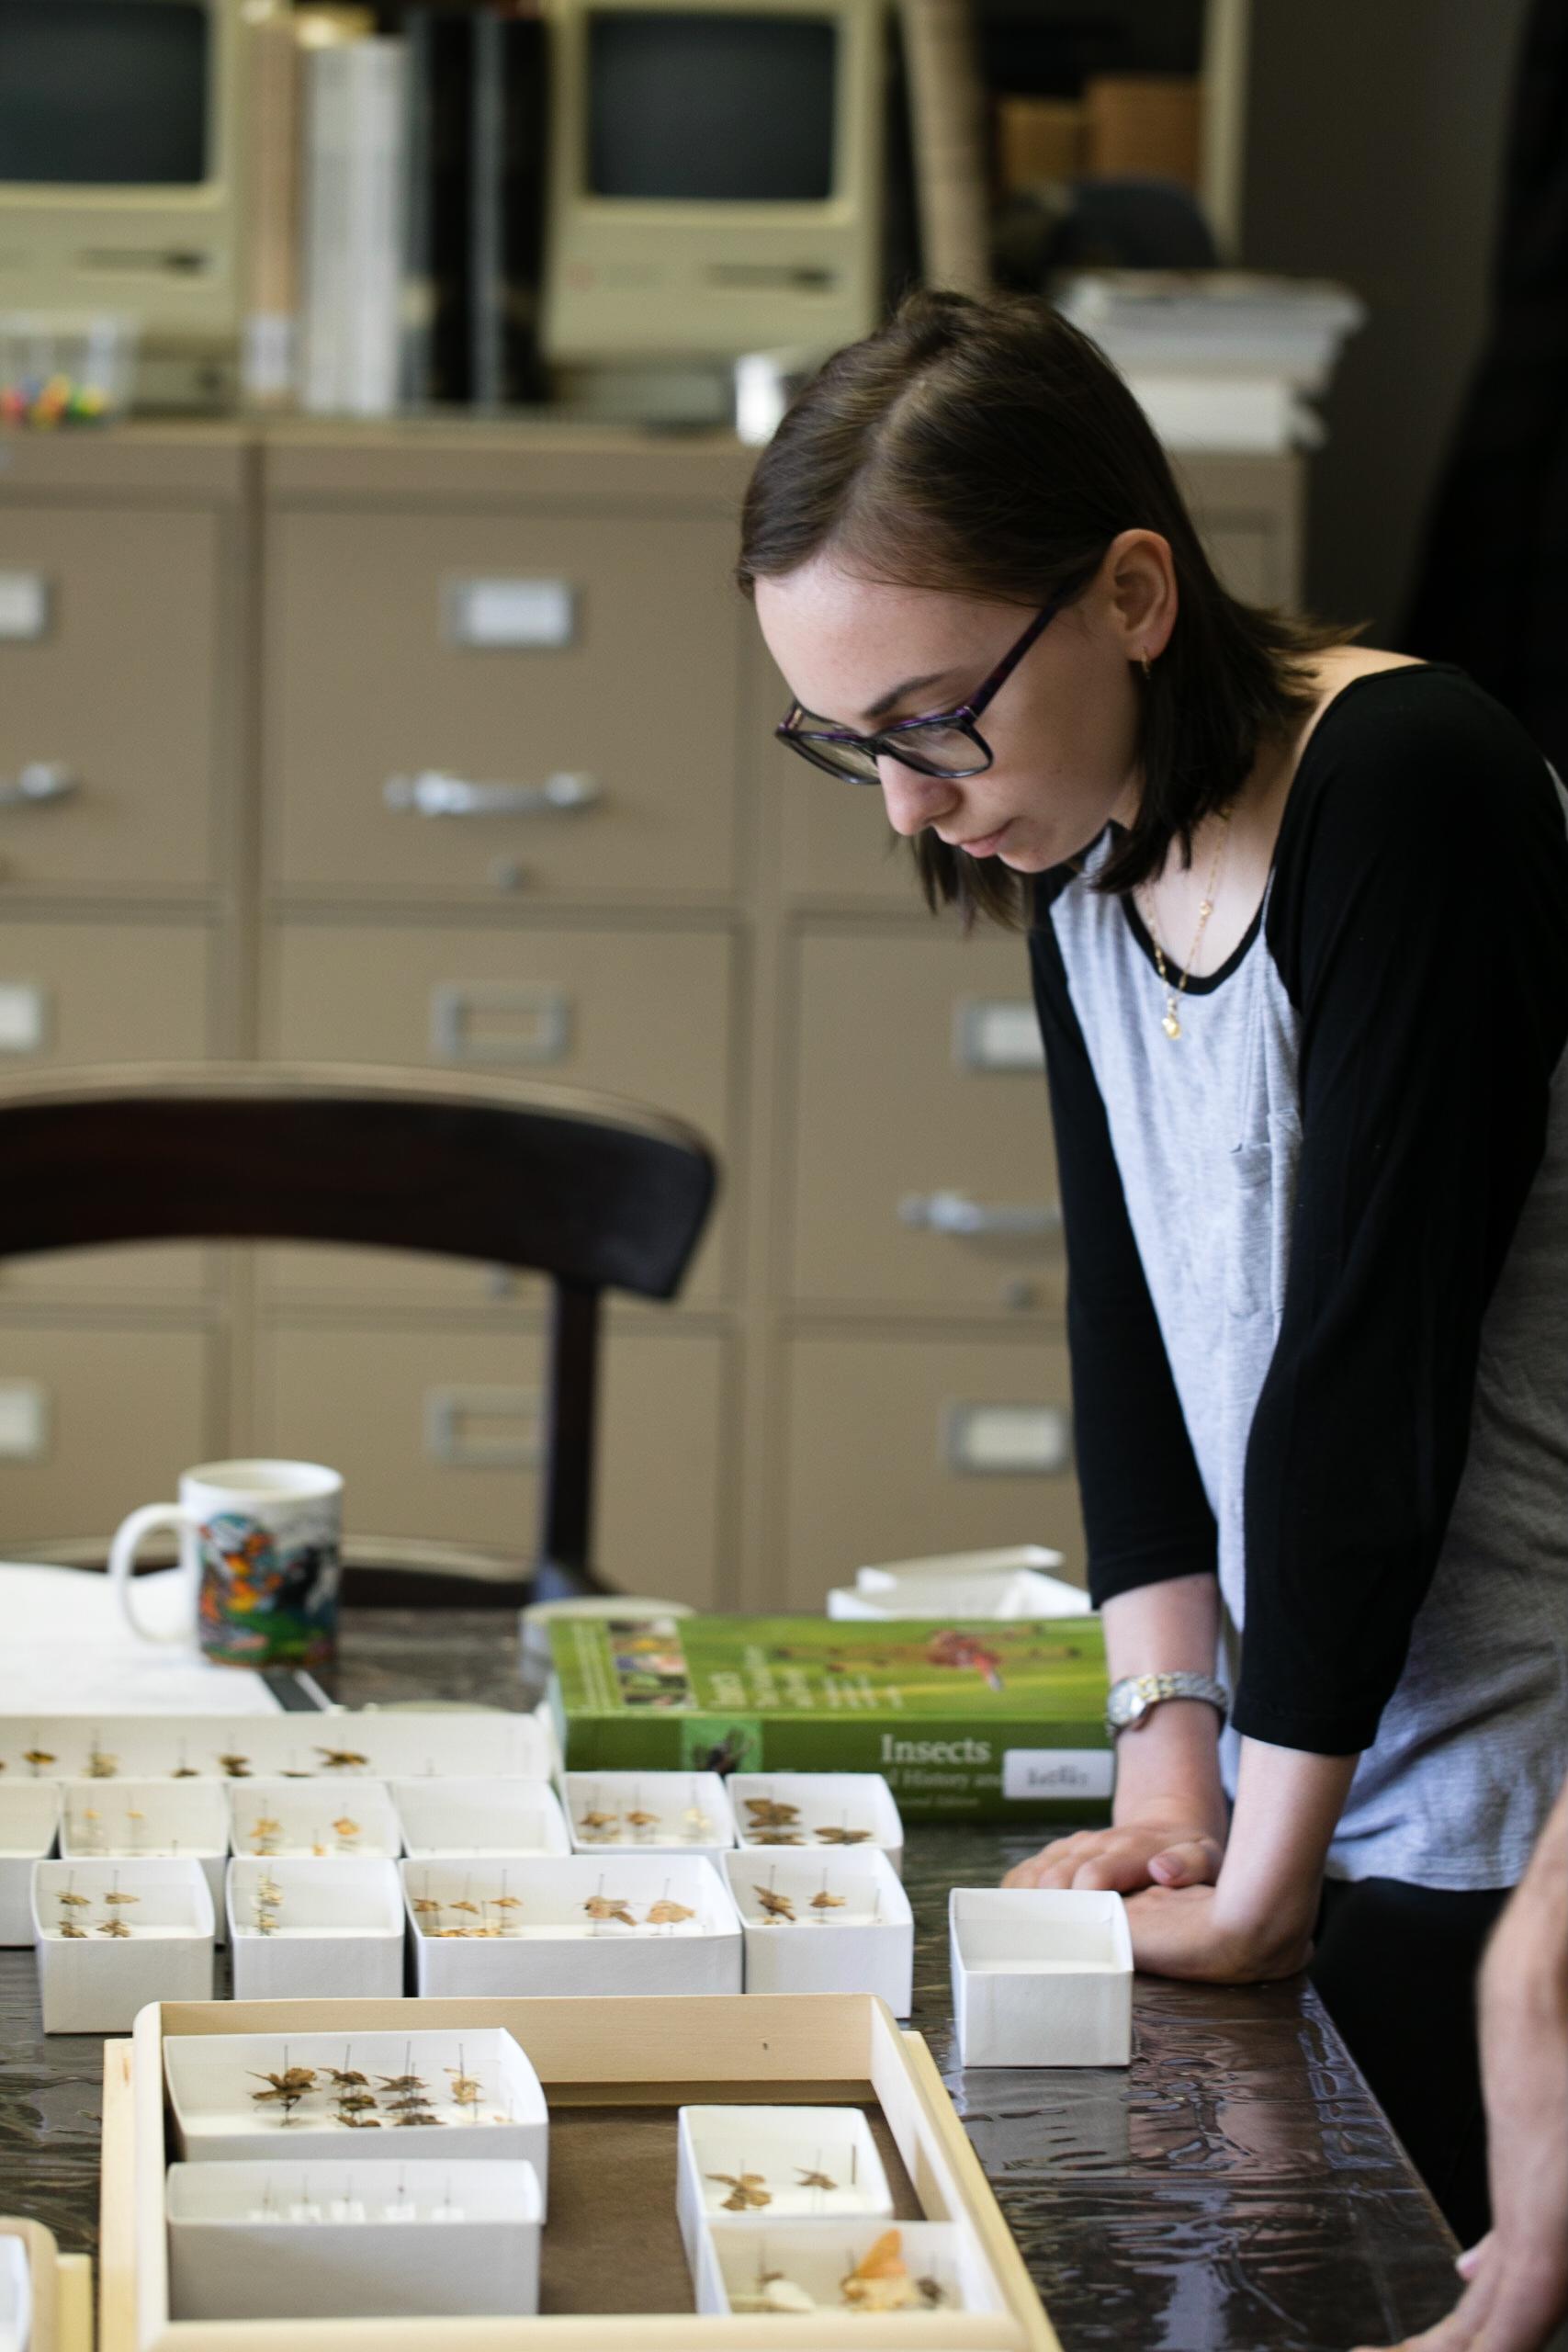 A student intern sorts moth specimens